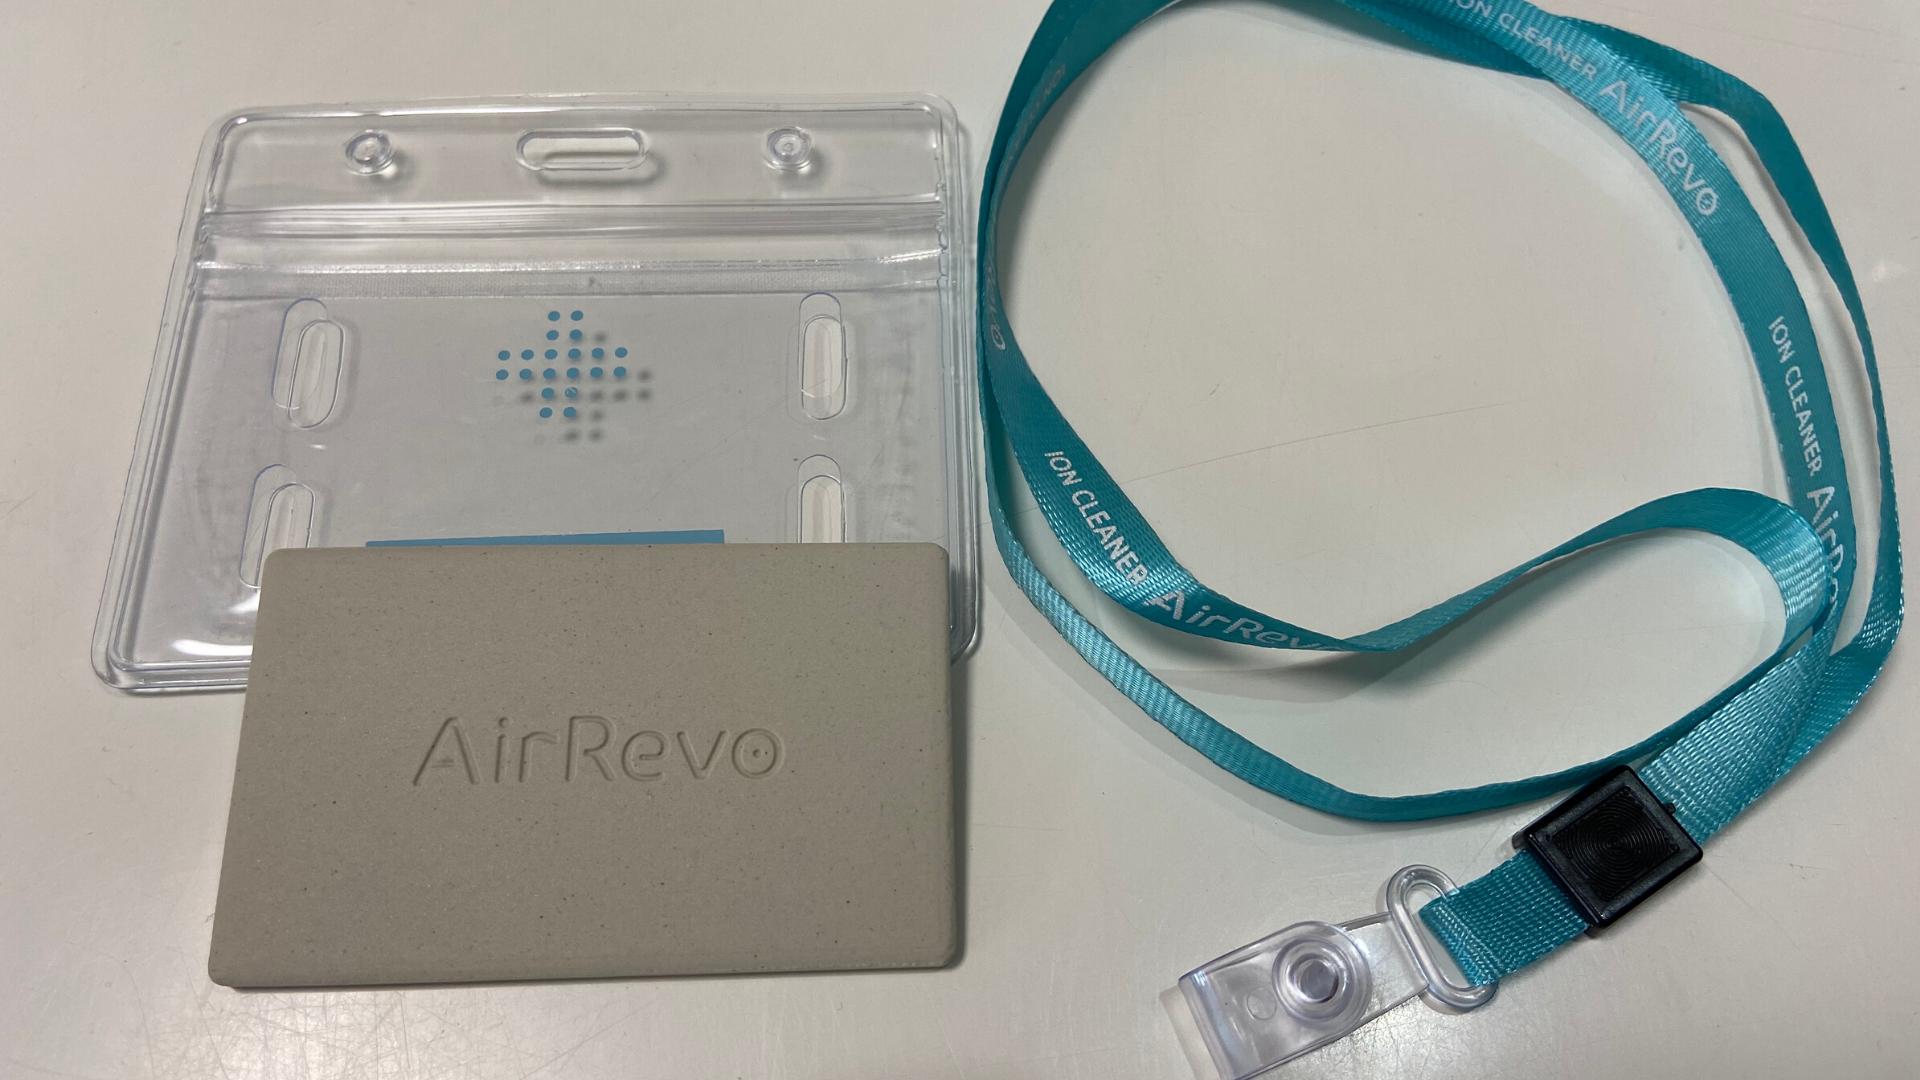 Air Revoセラミックカード